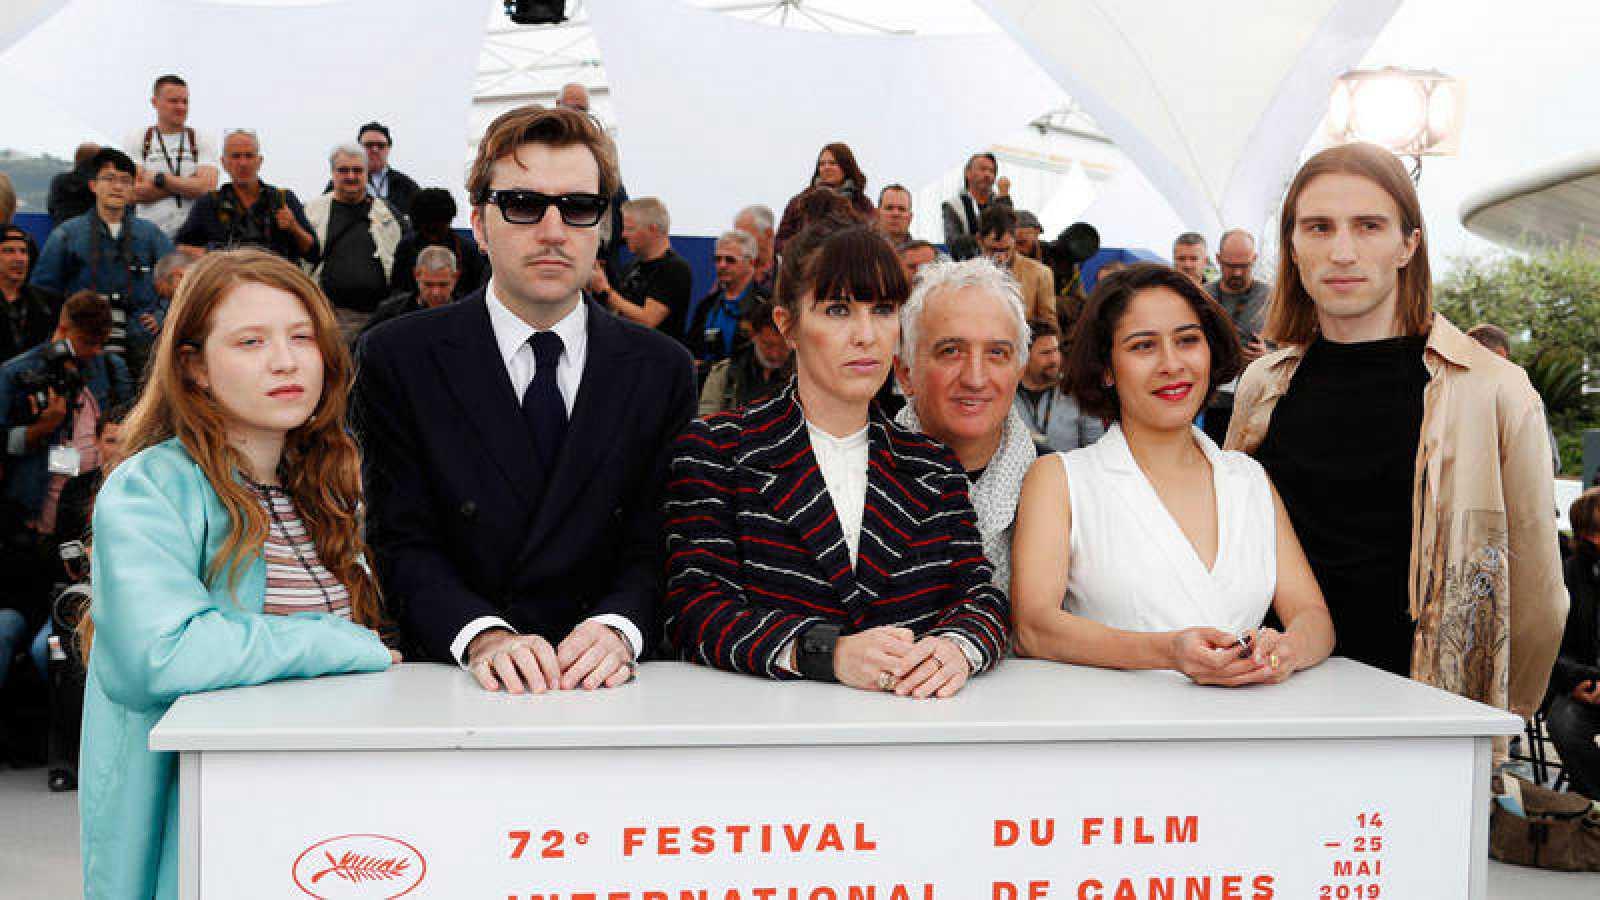 El director español Albert Serra posa junto al elenco de actores de 'Liberté' en el Festival de Cannes